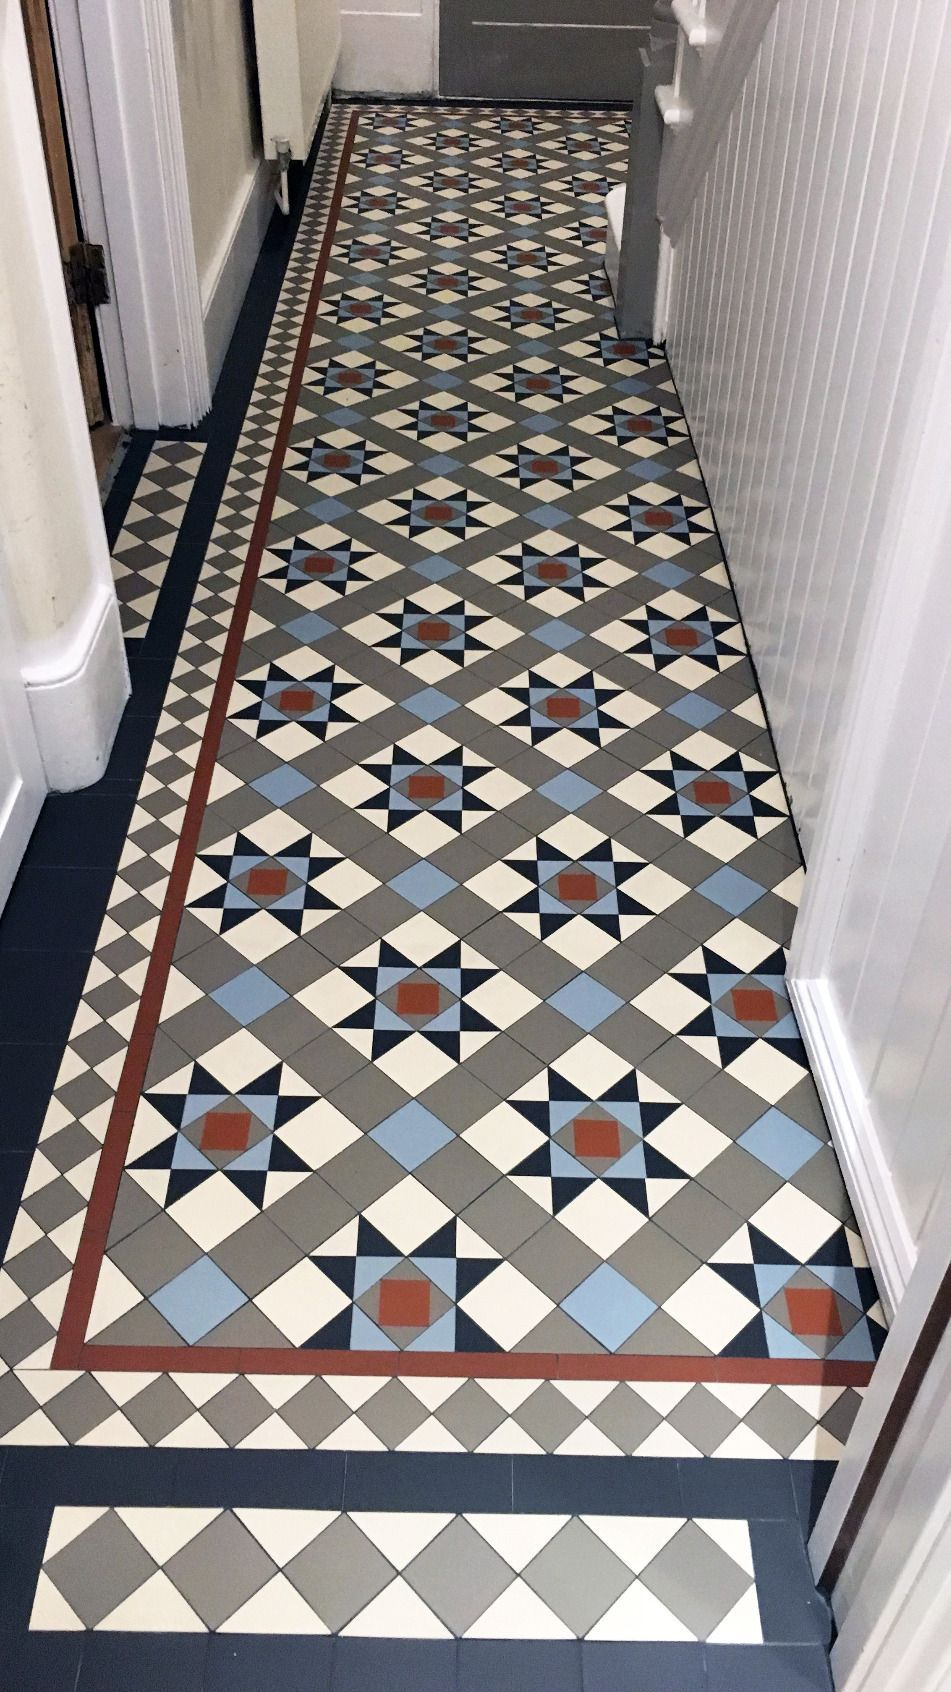 London Mosaic Victorian Hallway Tiles Www Londonmosaic Com Info Londonmosaic Com Londo In 2020 Tiled Hallway Contemporary Tile Floor Victorian Hallway Tiles